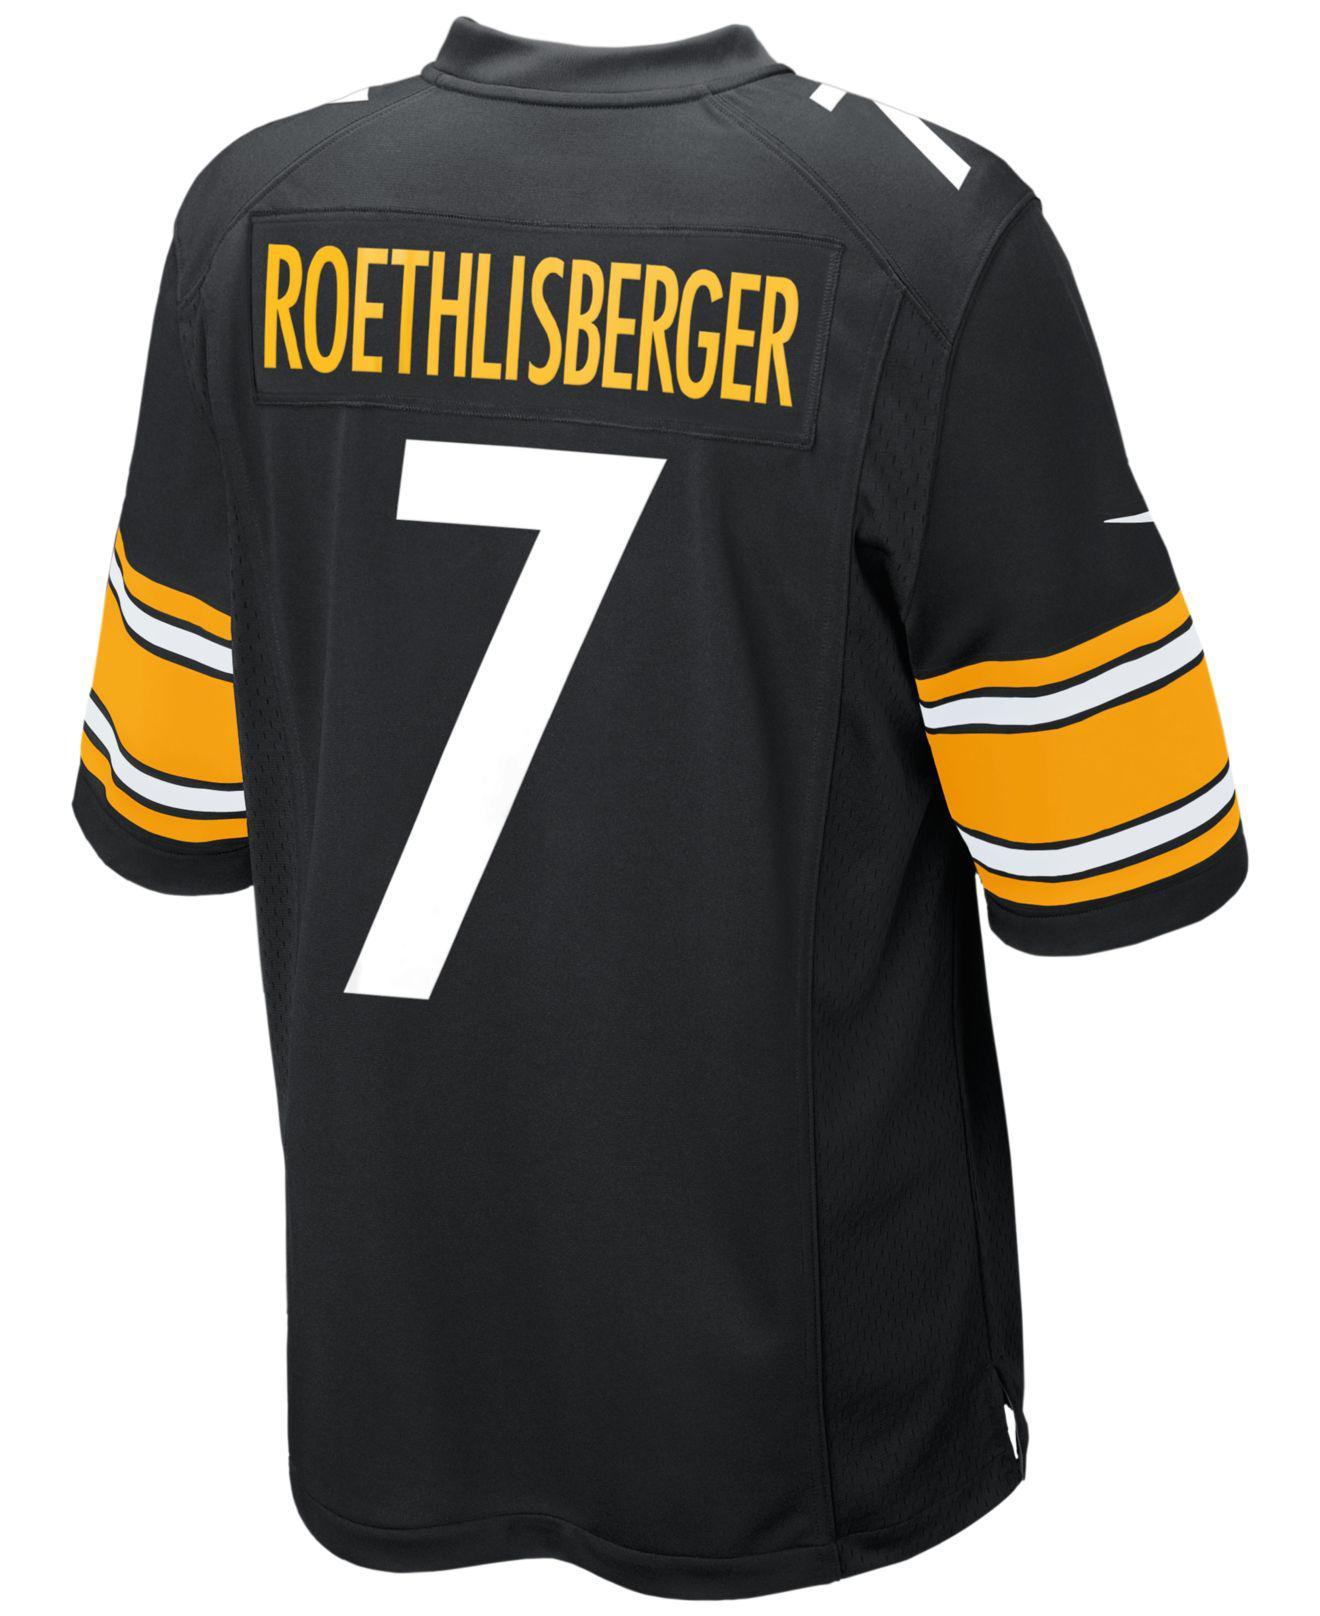 025b0d2f4 Lyst - Nike Men s Ben Roethlisberger Pittsburgh Steelers Game Jersey ...